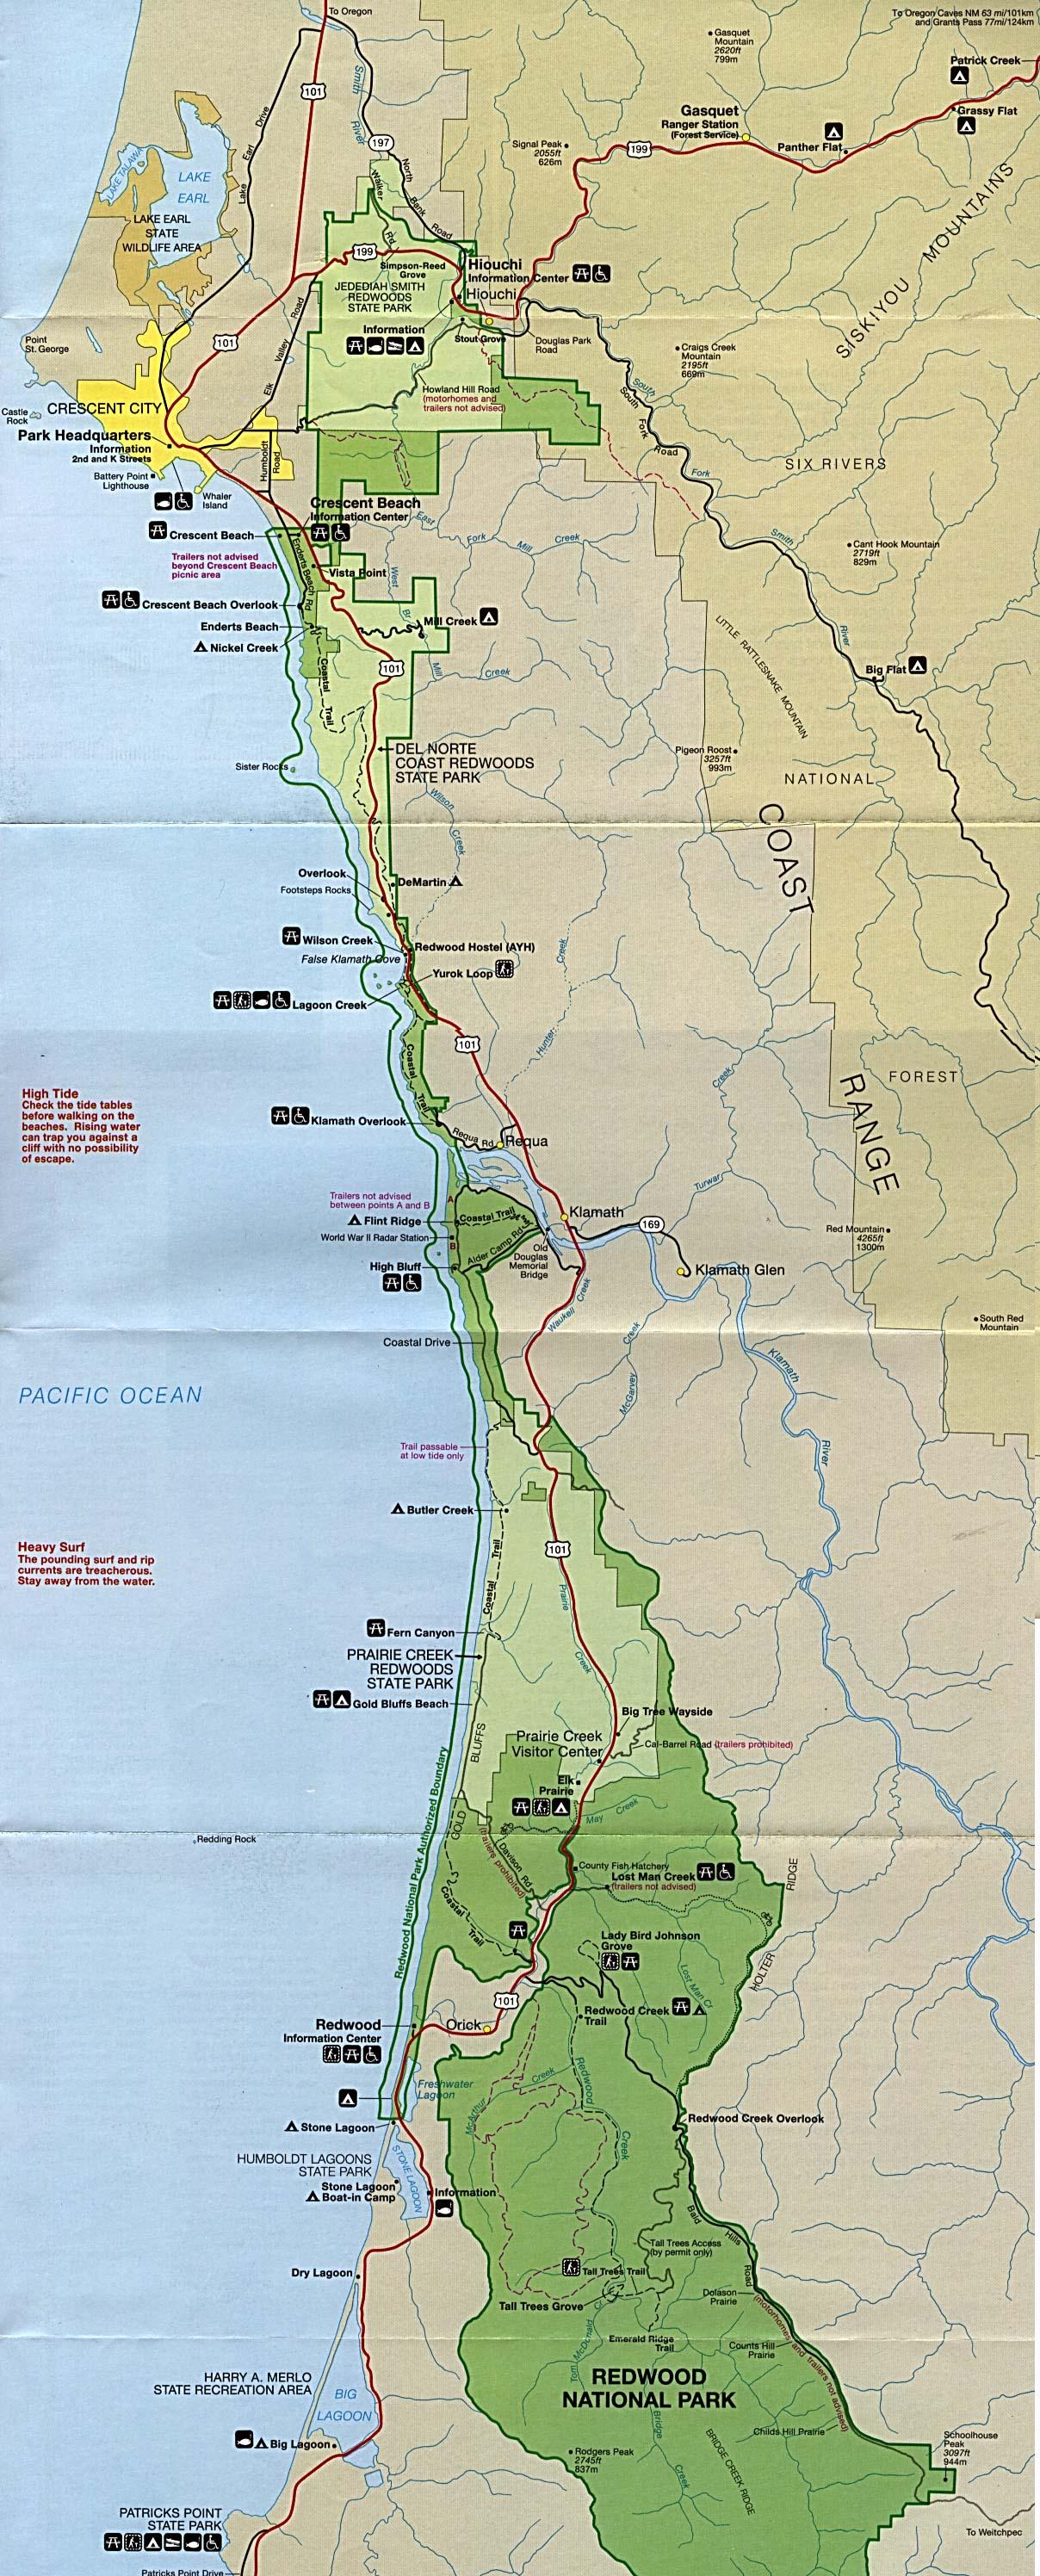 Redwood National Park Map Map Of California Springs California - Redwood Park California Map